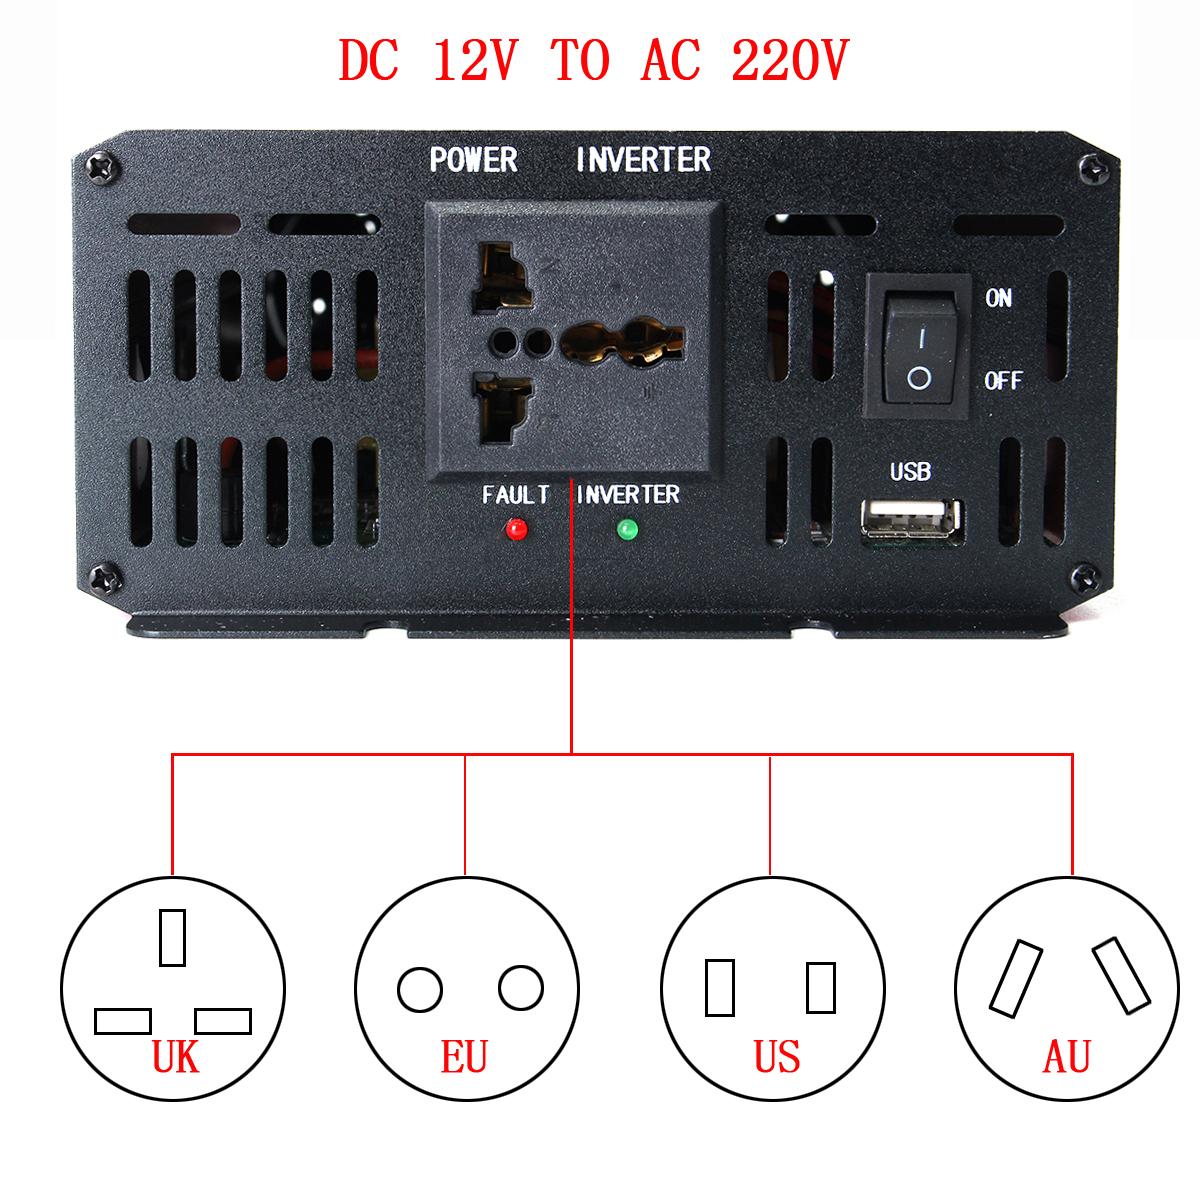 dc to ac inverter diagram 2001 nissan frontier wiring 2500w car 12v 220v power converter